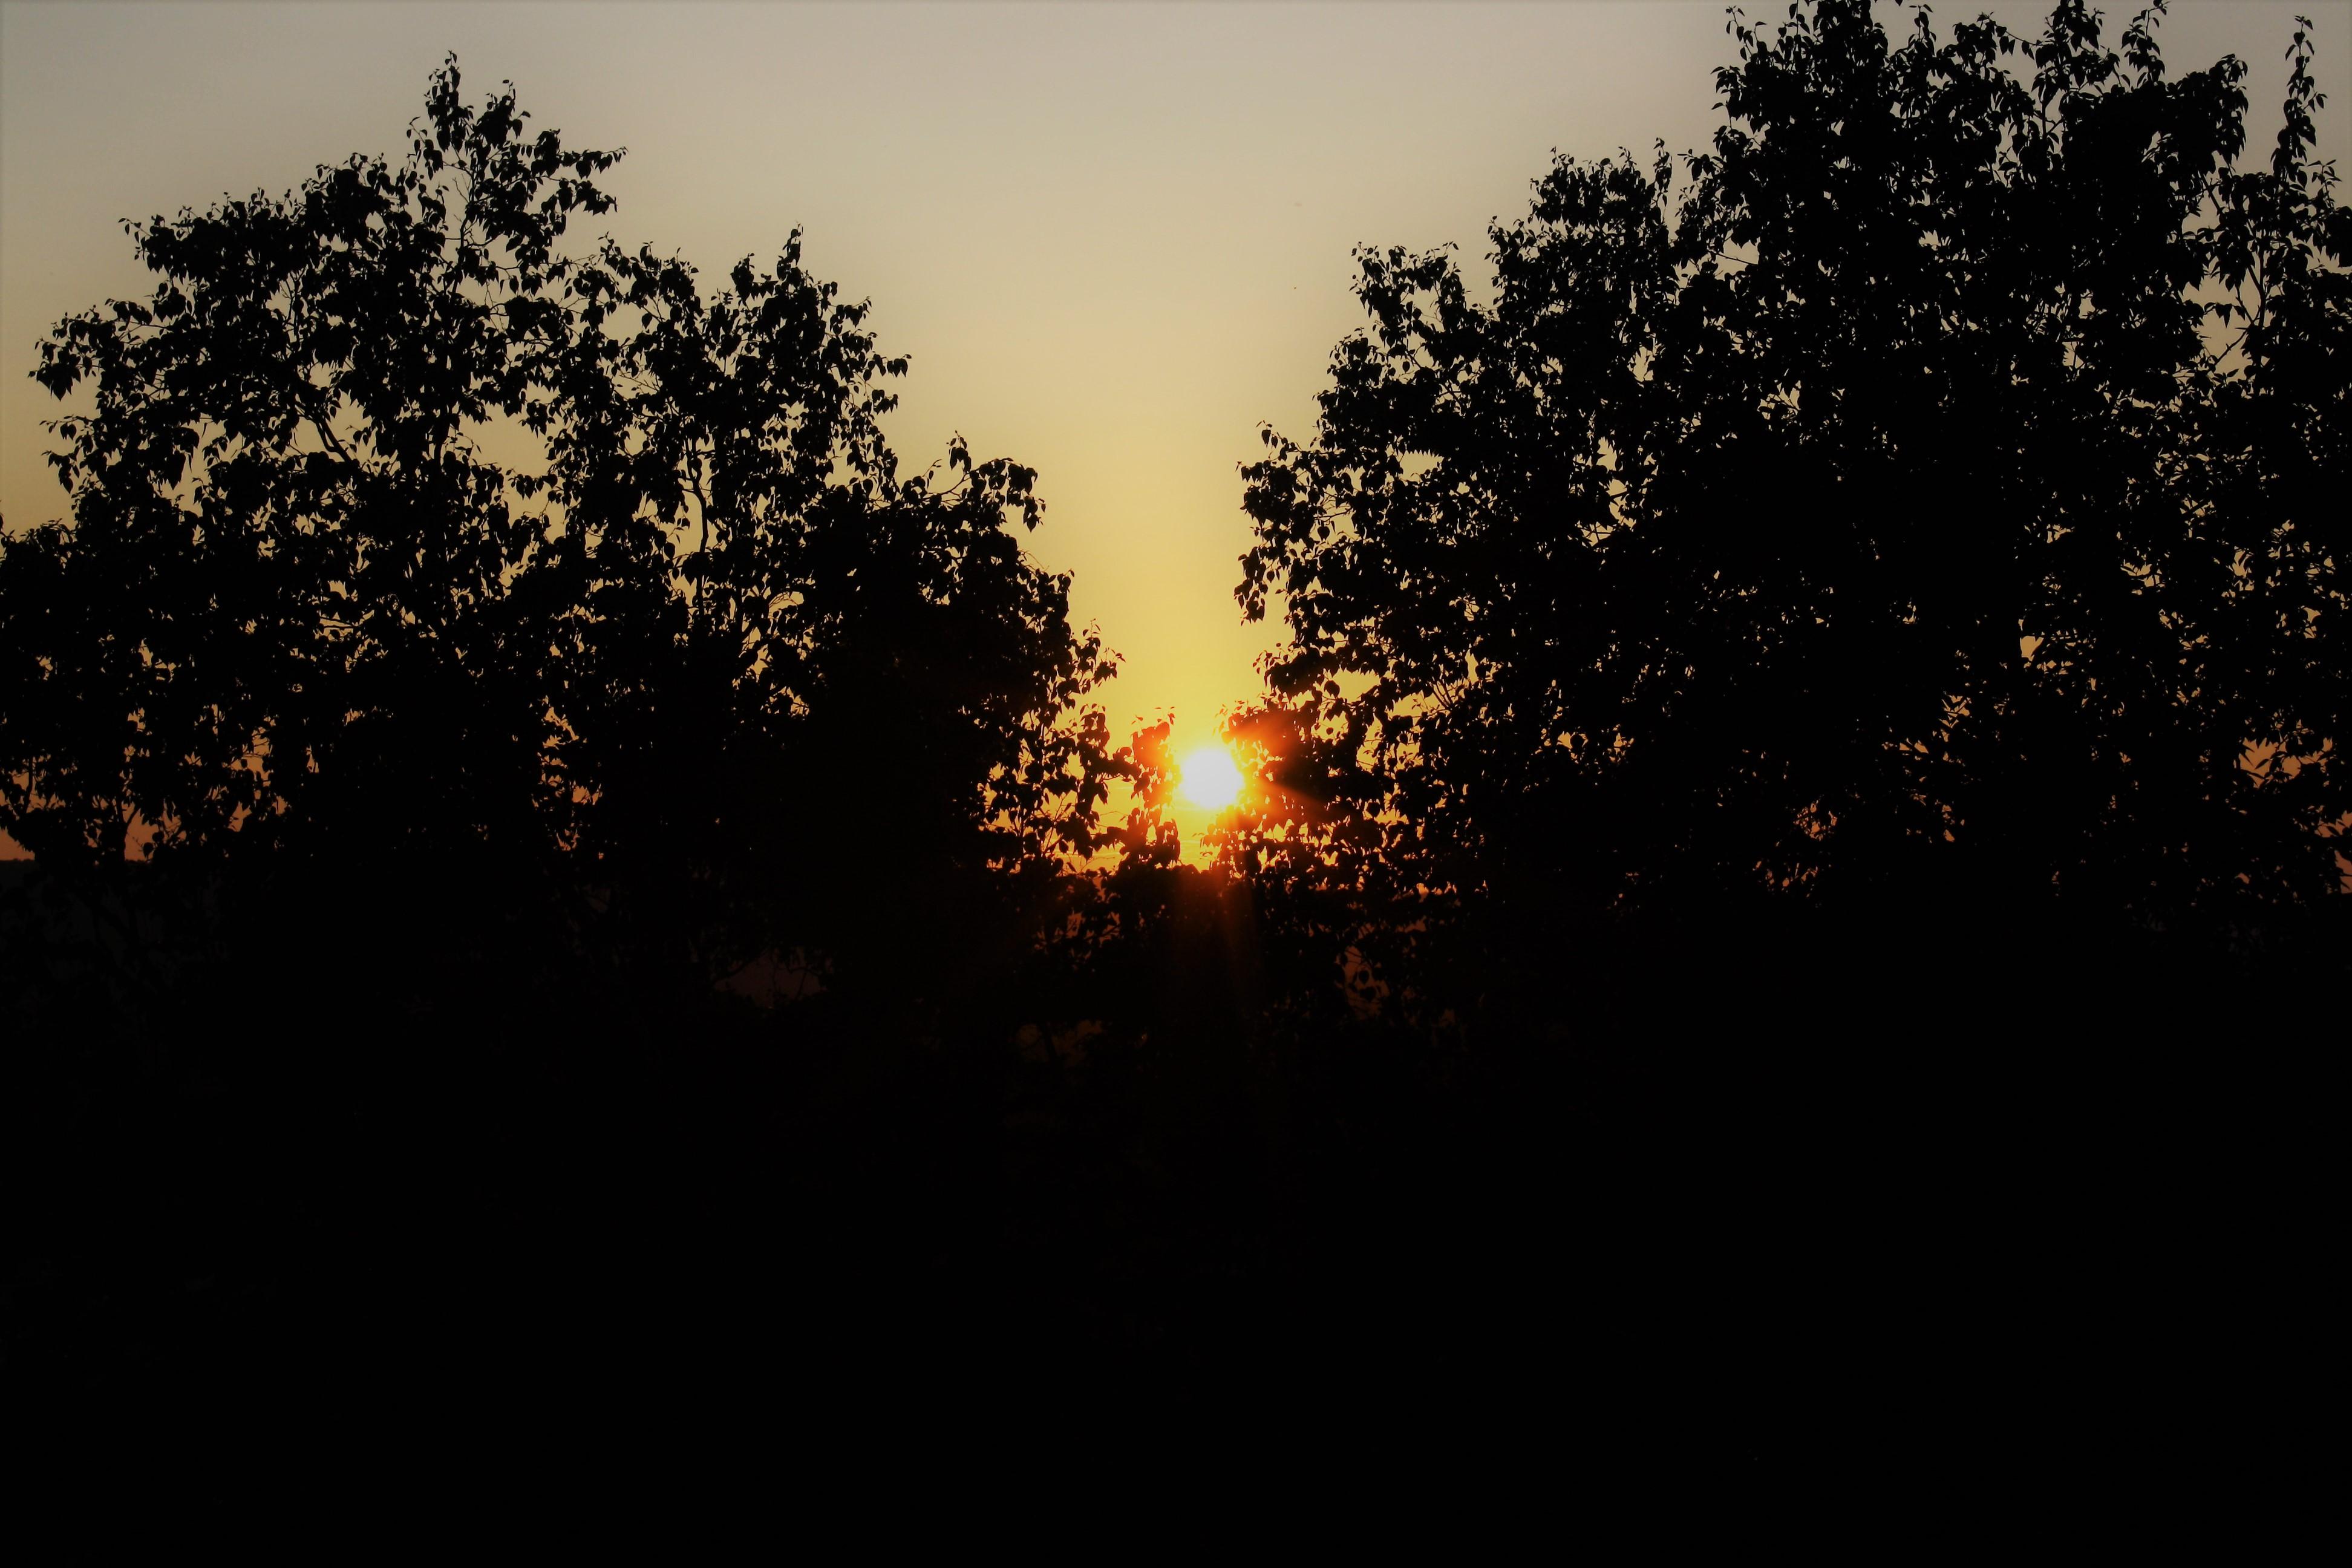 DM_nature_sunsetssunrises_588